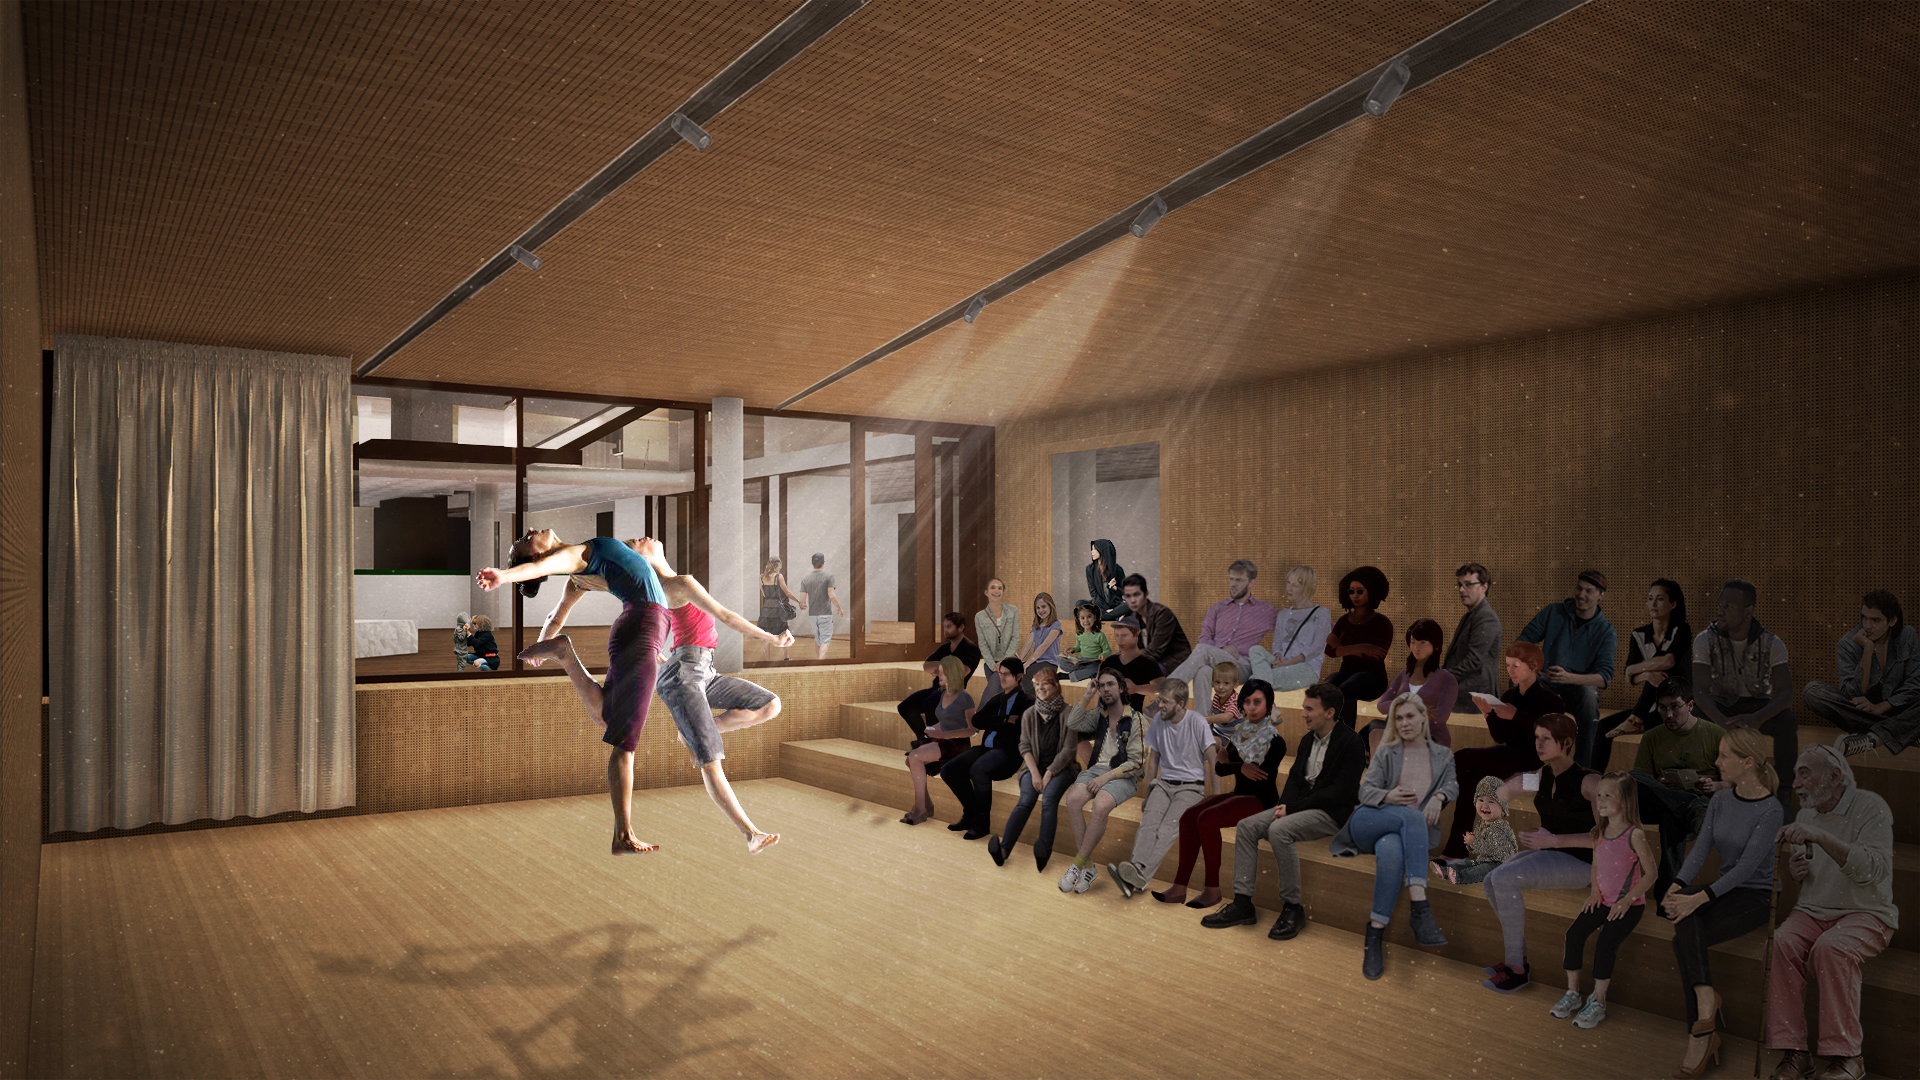 <p>Interieur auditorium. Theater aan de Parade door NOAHH   Network Oriented Architecture</p>